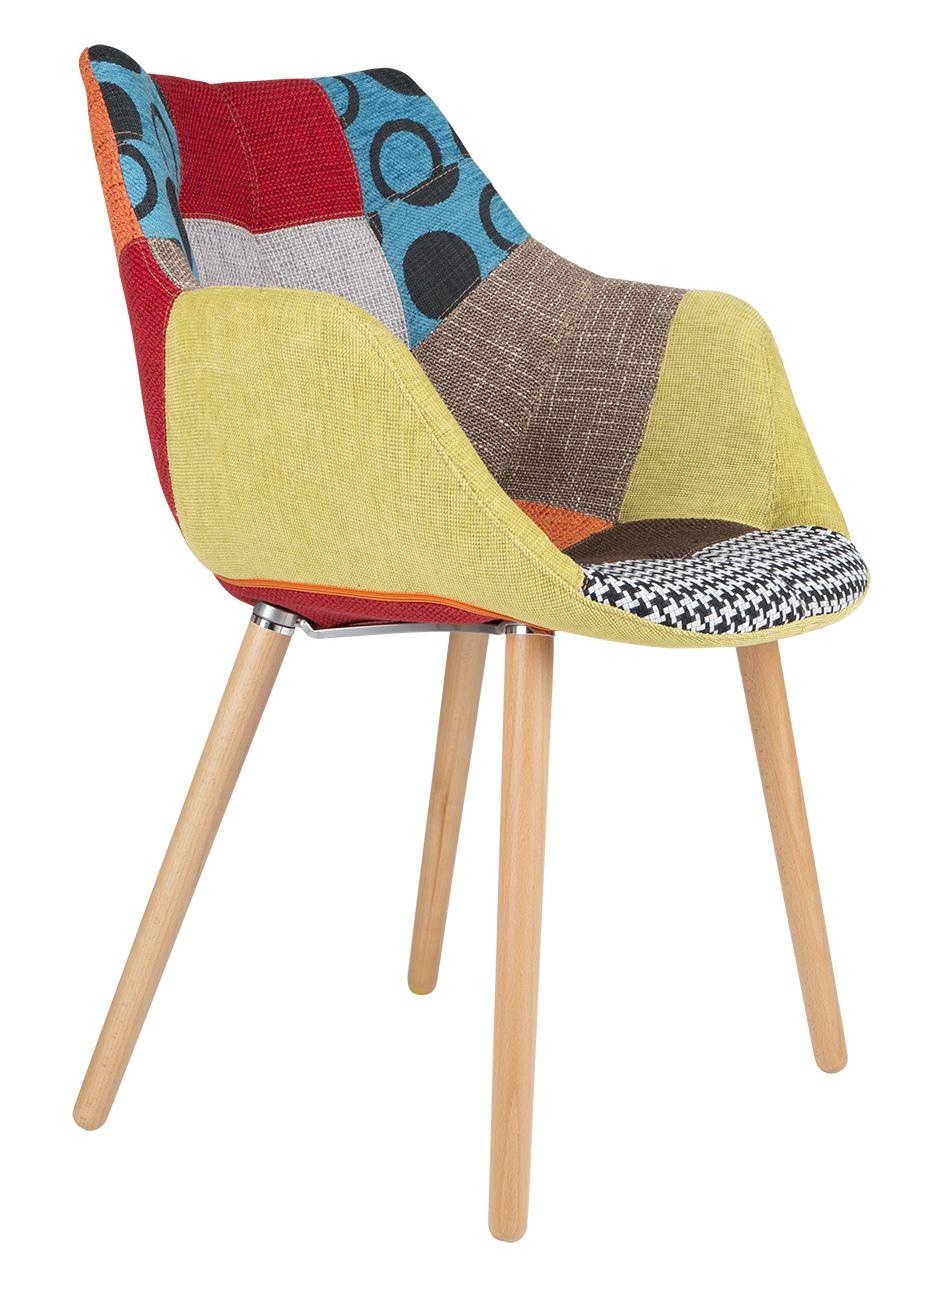 Кресло Zuiver Twelve - patchwork colour - 1100266